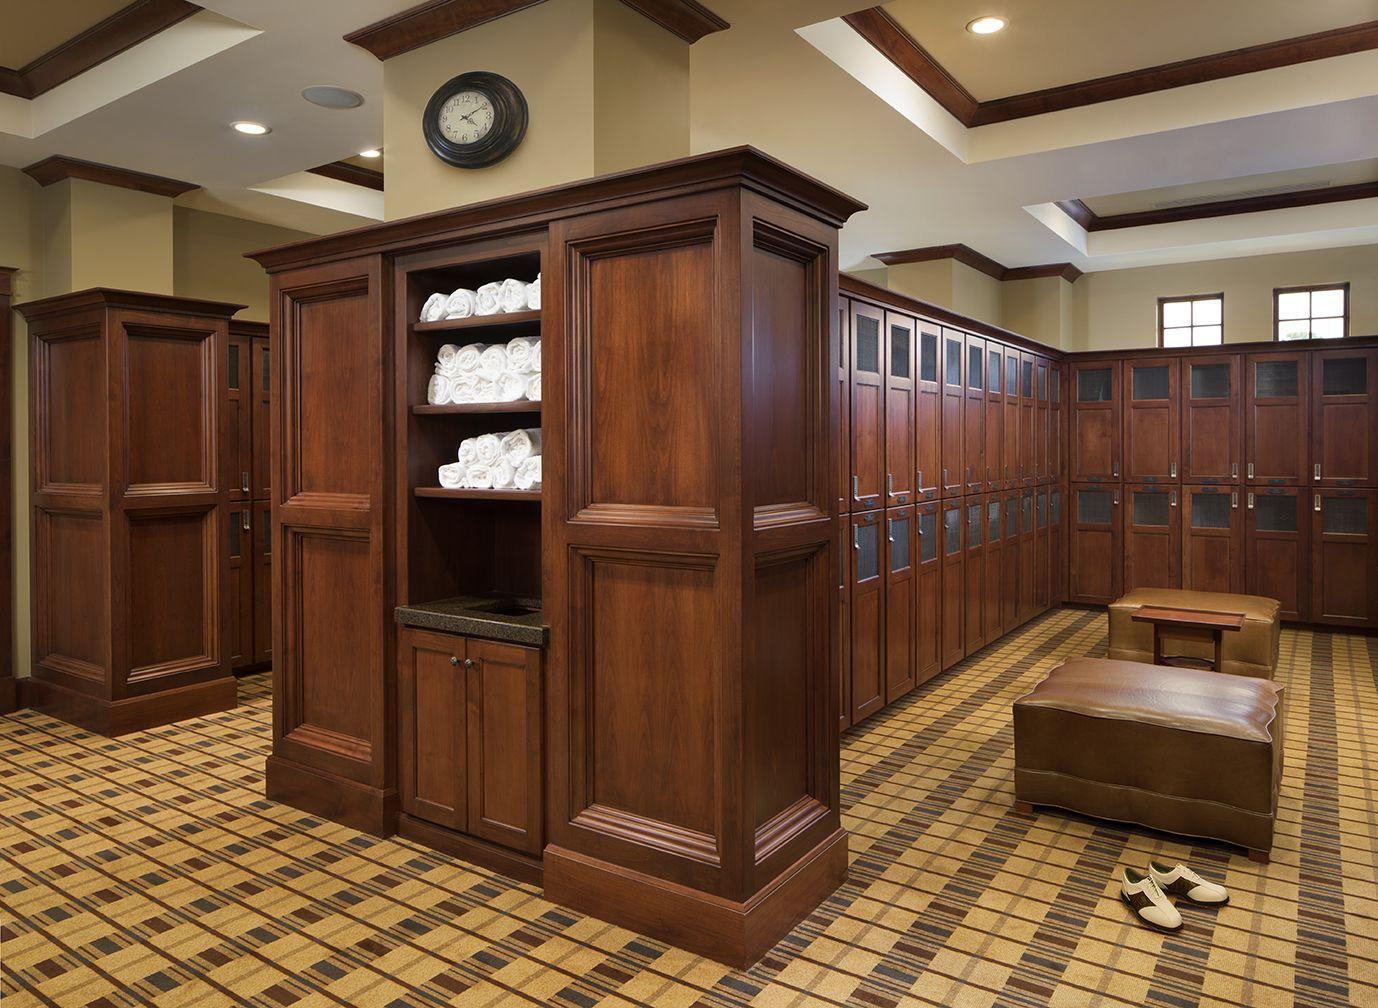 Locker Room - Los Altos | Golf clubhouse, Clubhouse design ...